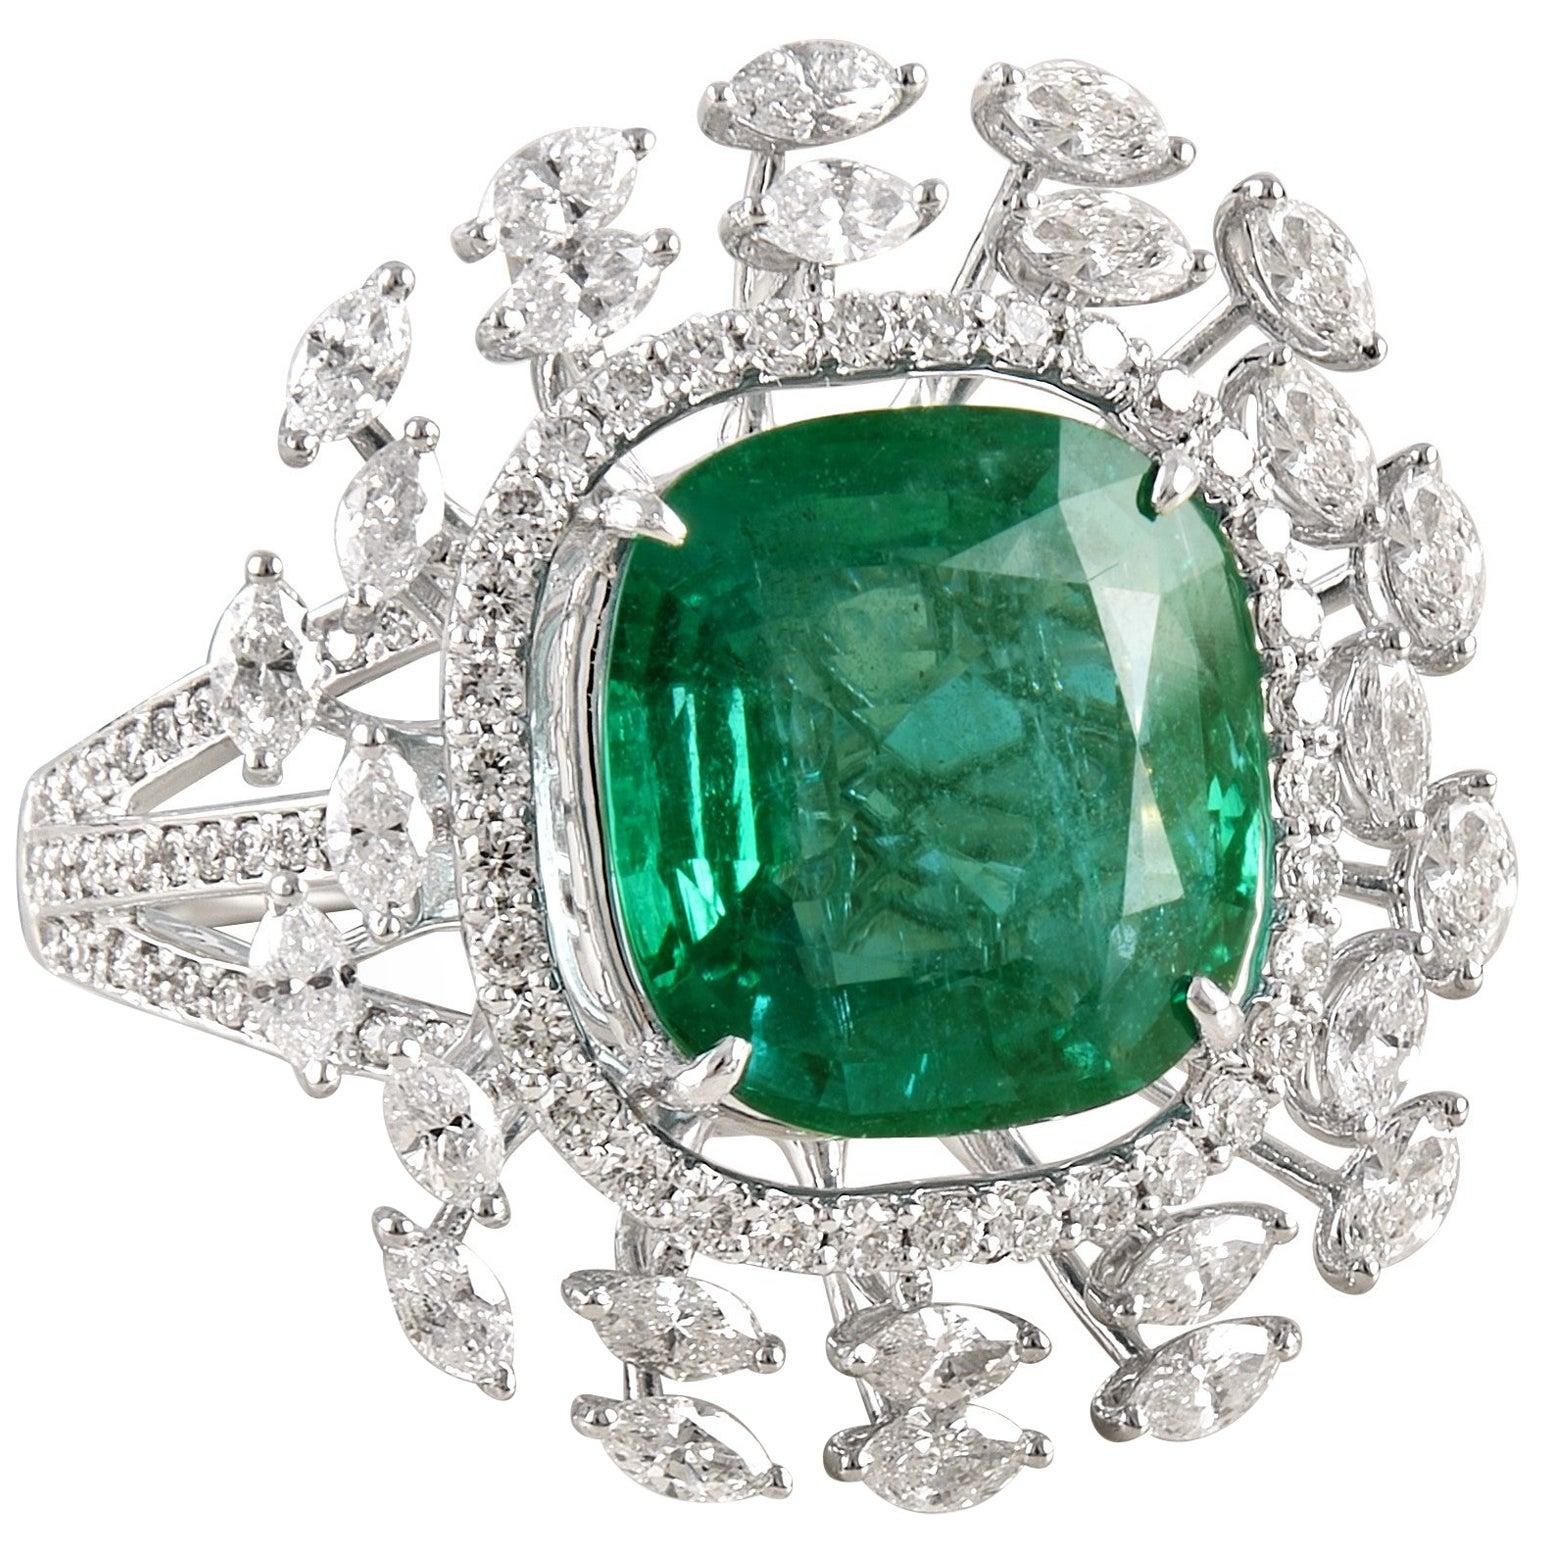 Emerald 18k Gold White Diamond Cocktail Ring